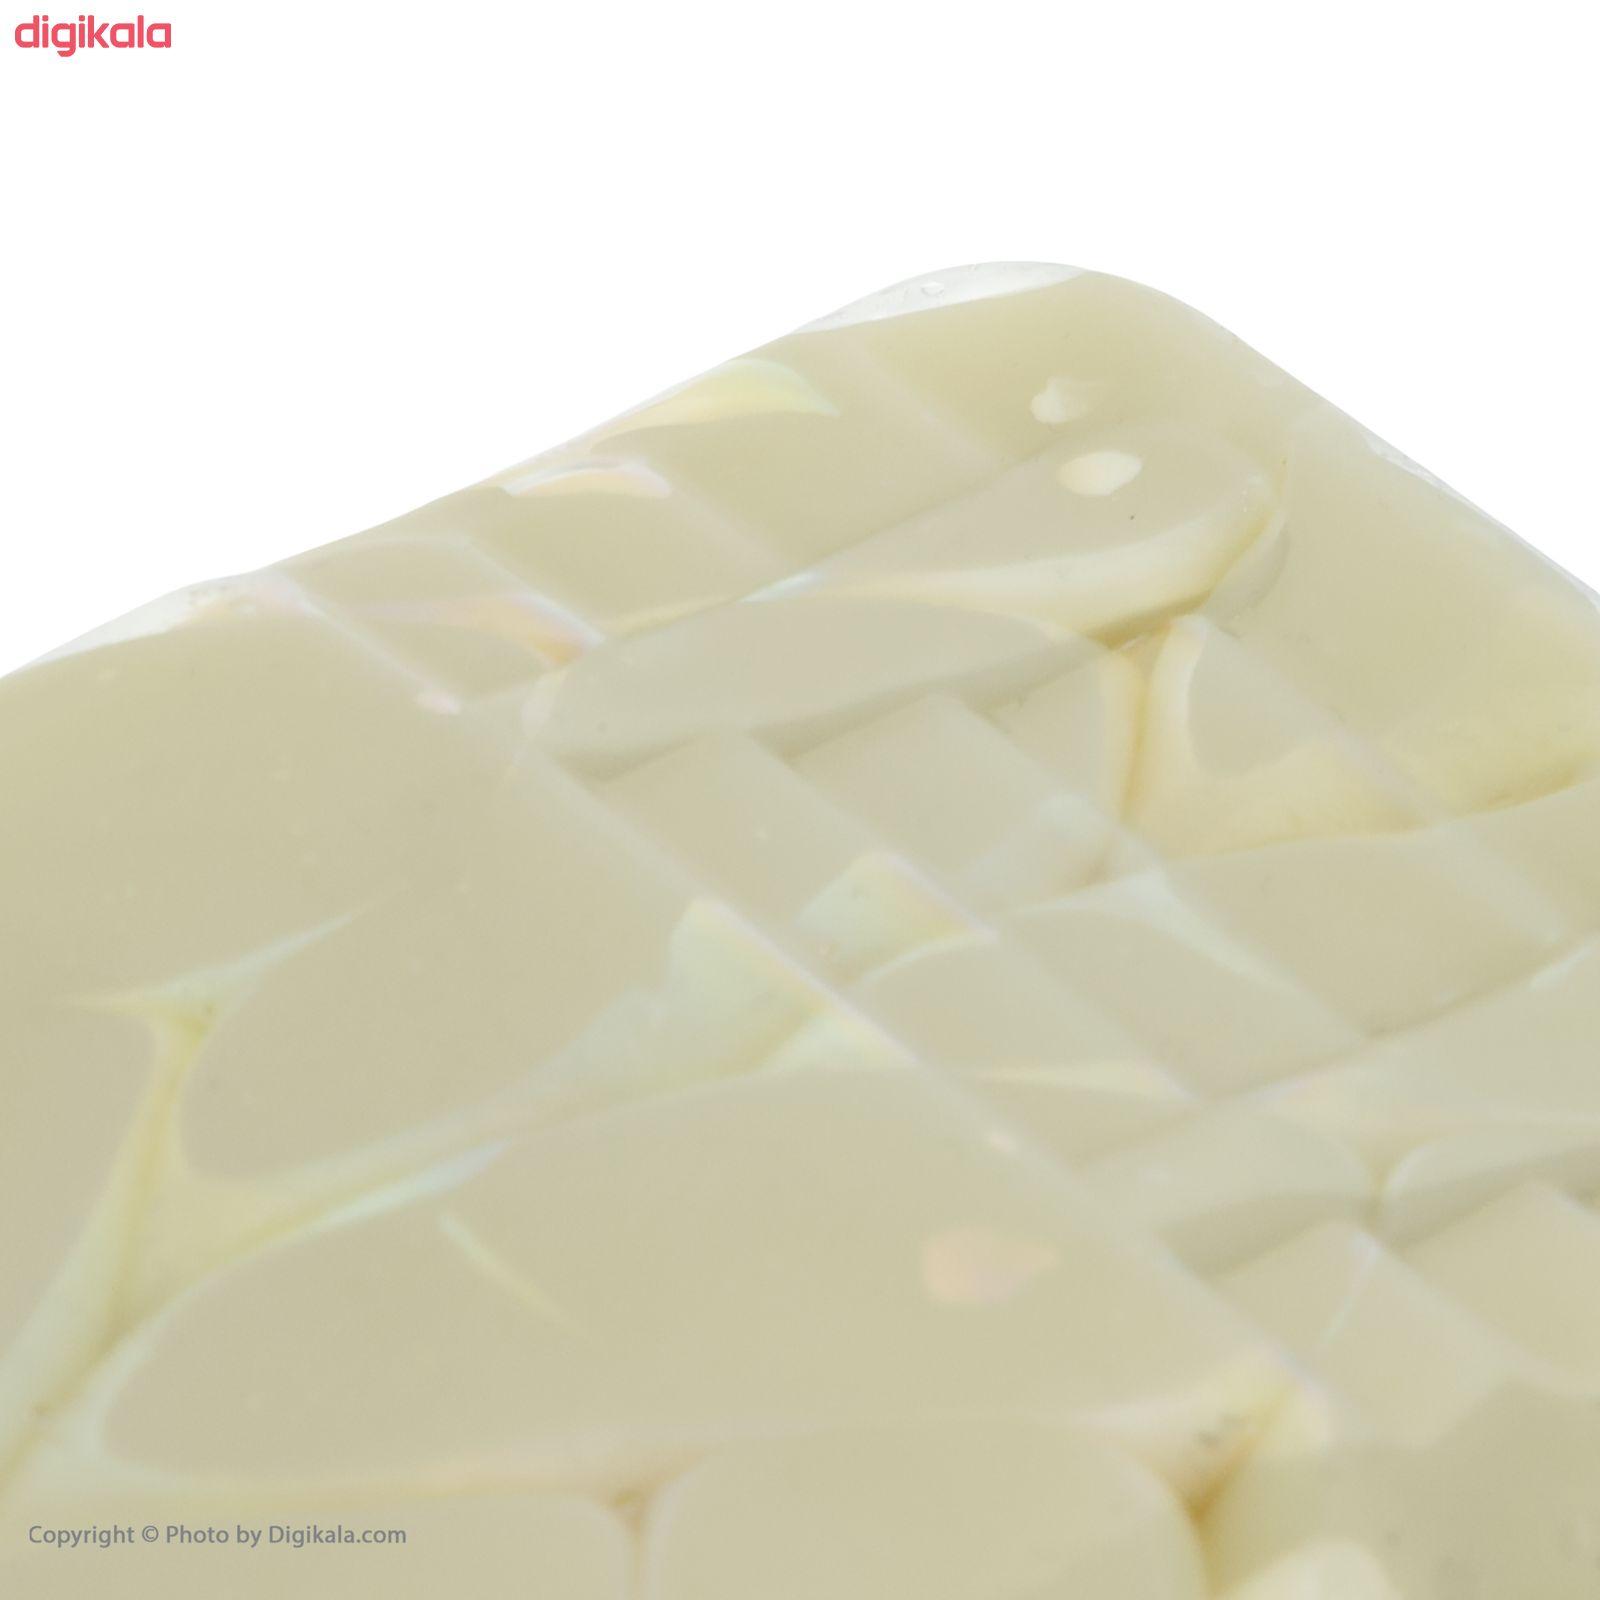 پنیر موزارلا گیس بافت کالین - 200 گرم main 1 5